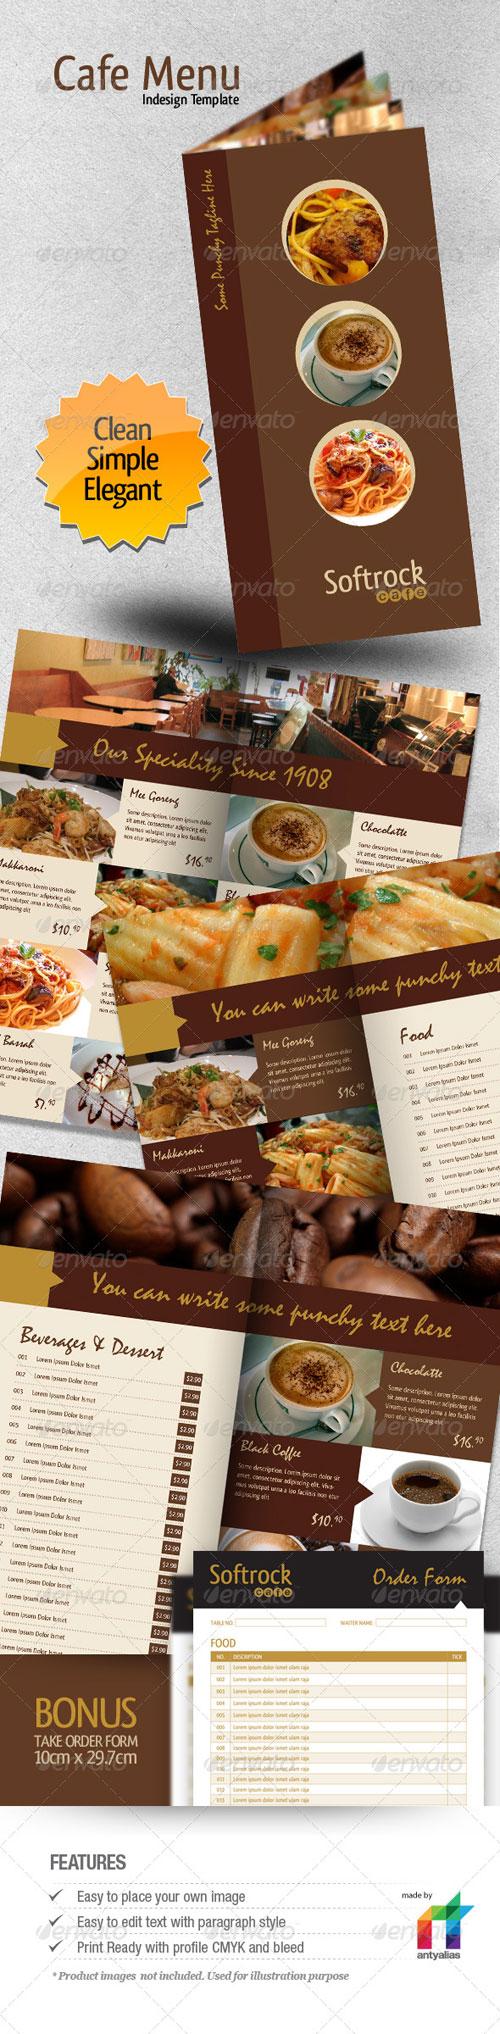 Cafe menu indesign template free ebooks download ebookee